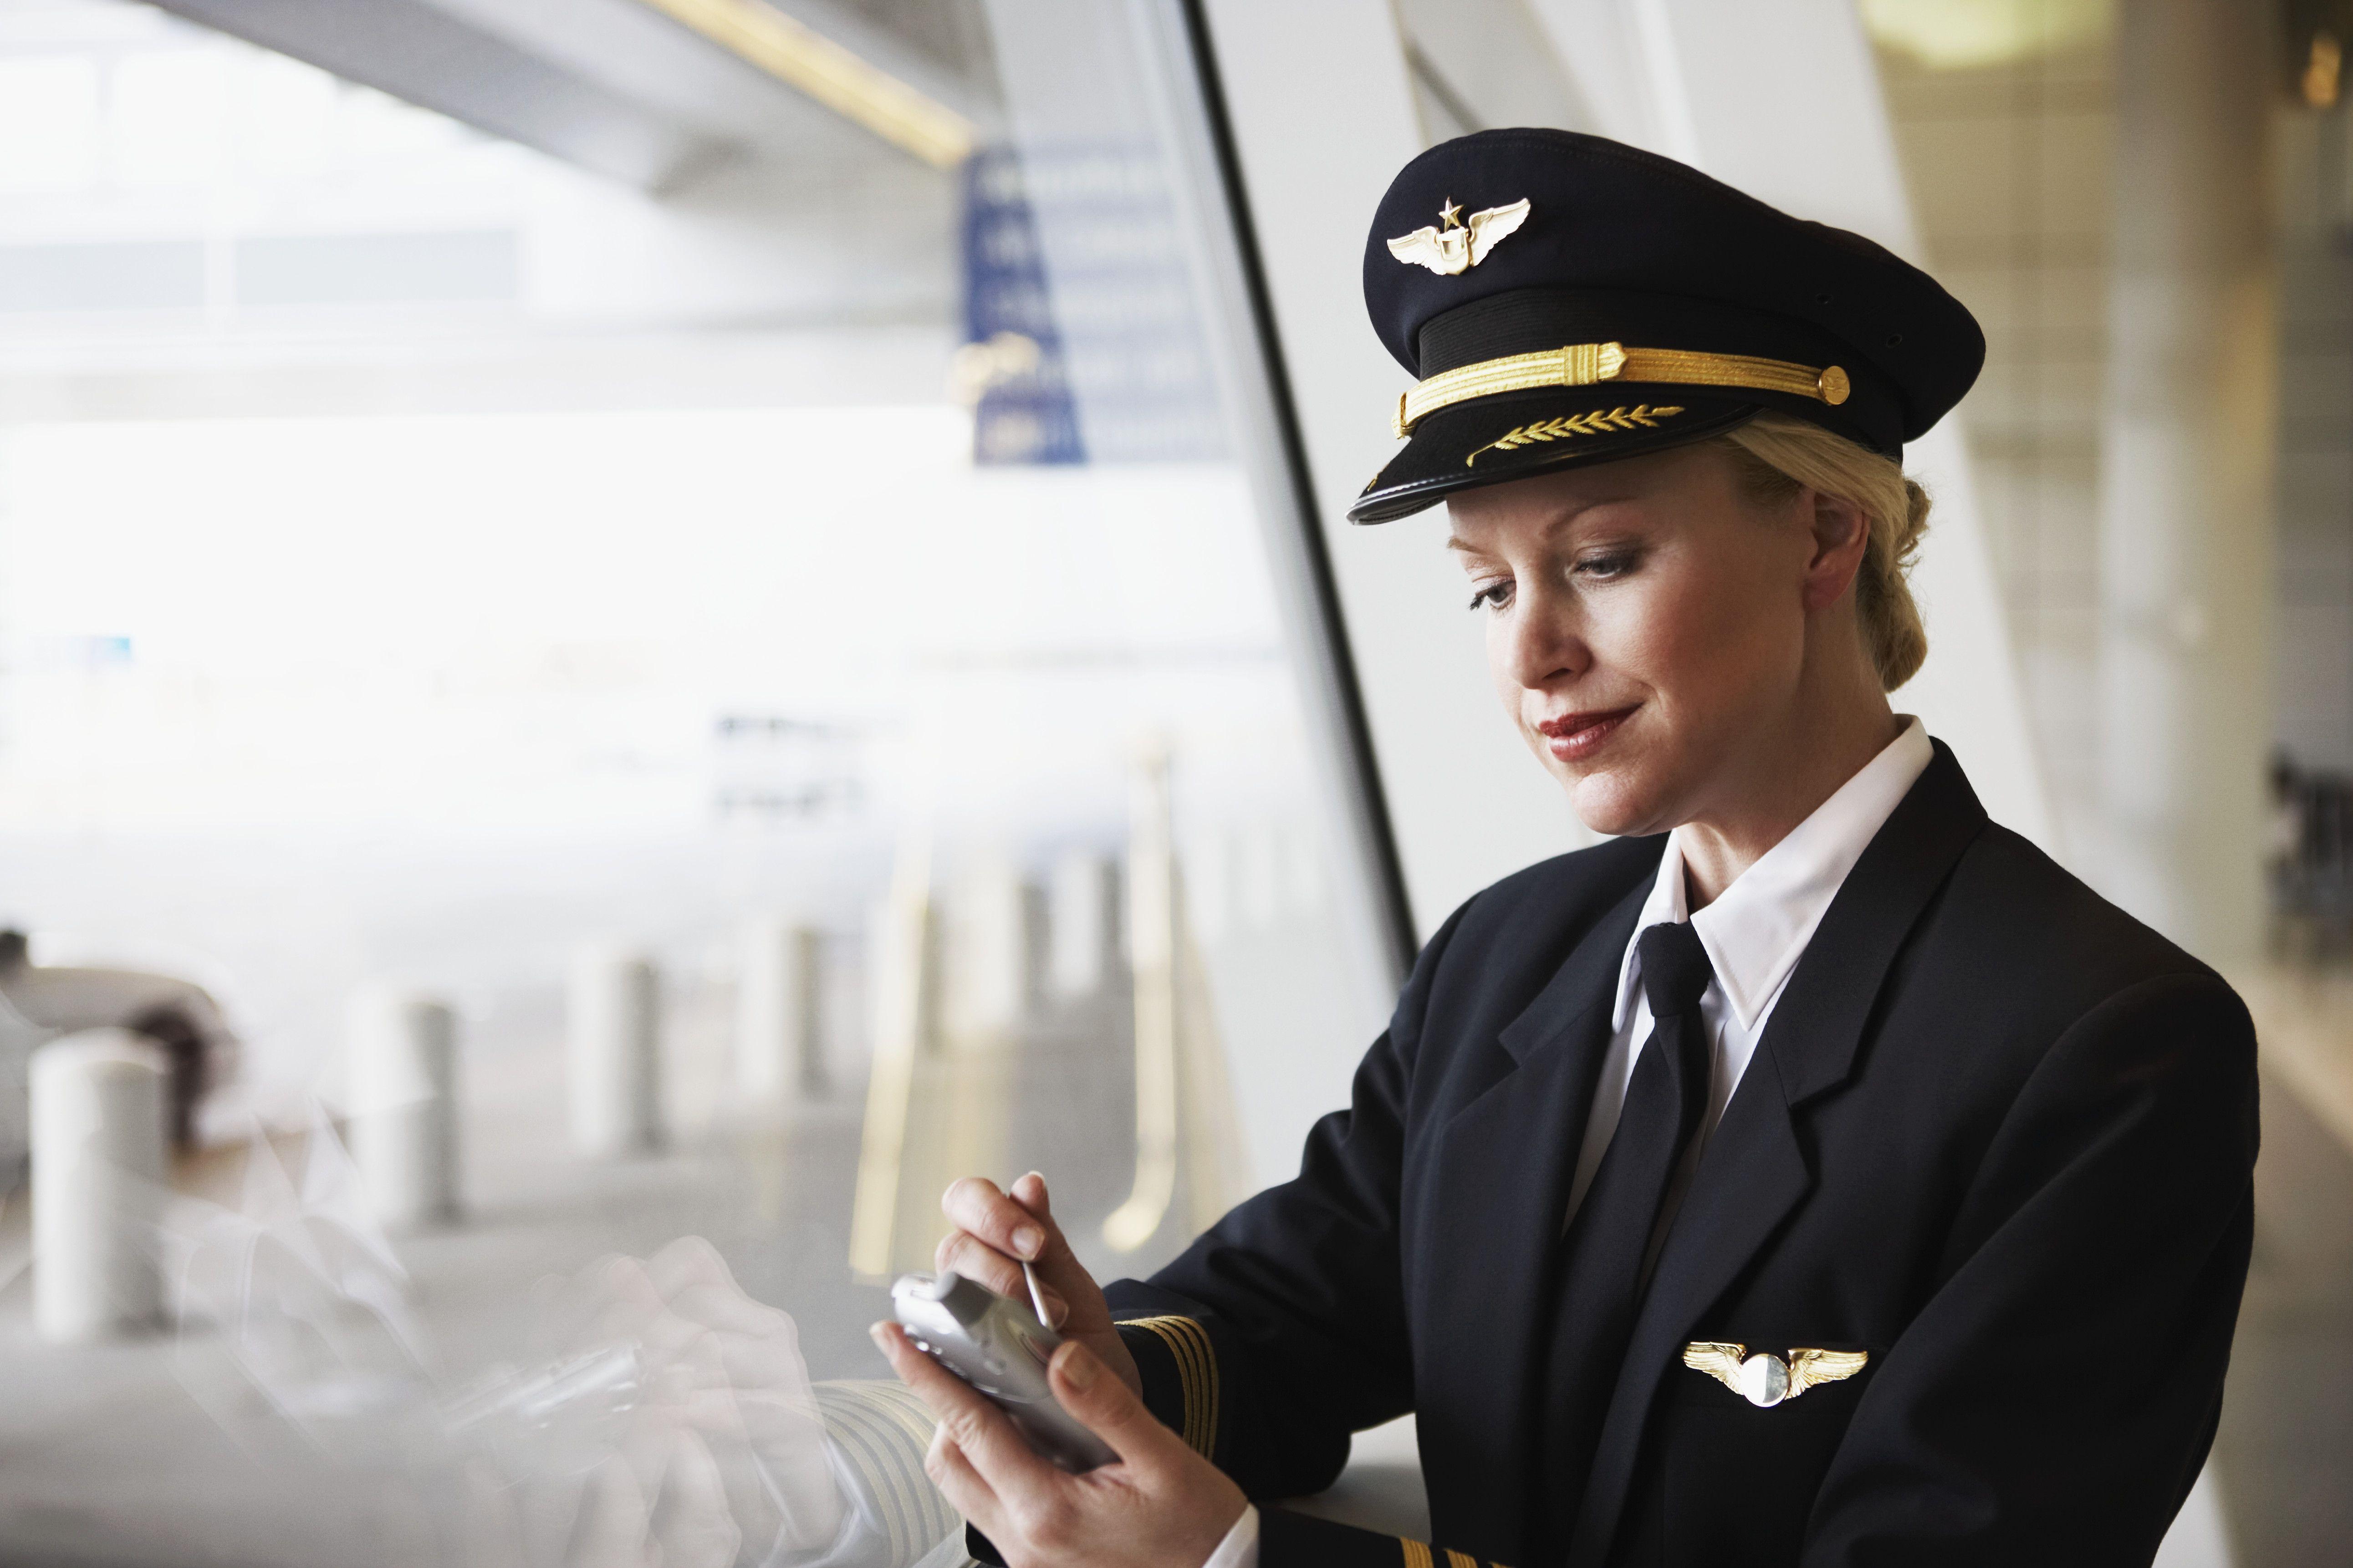 How I got my job as a pilot - how to be a pilot